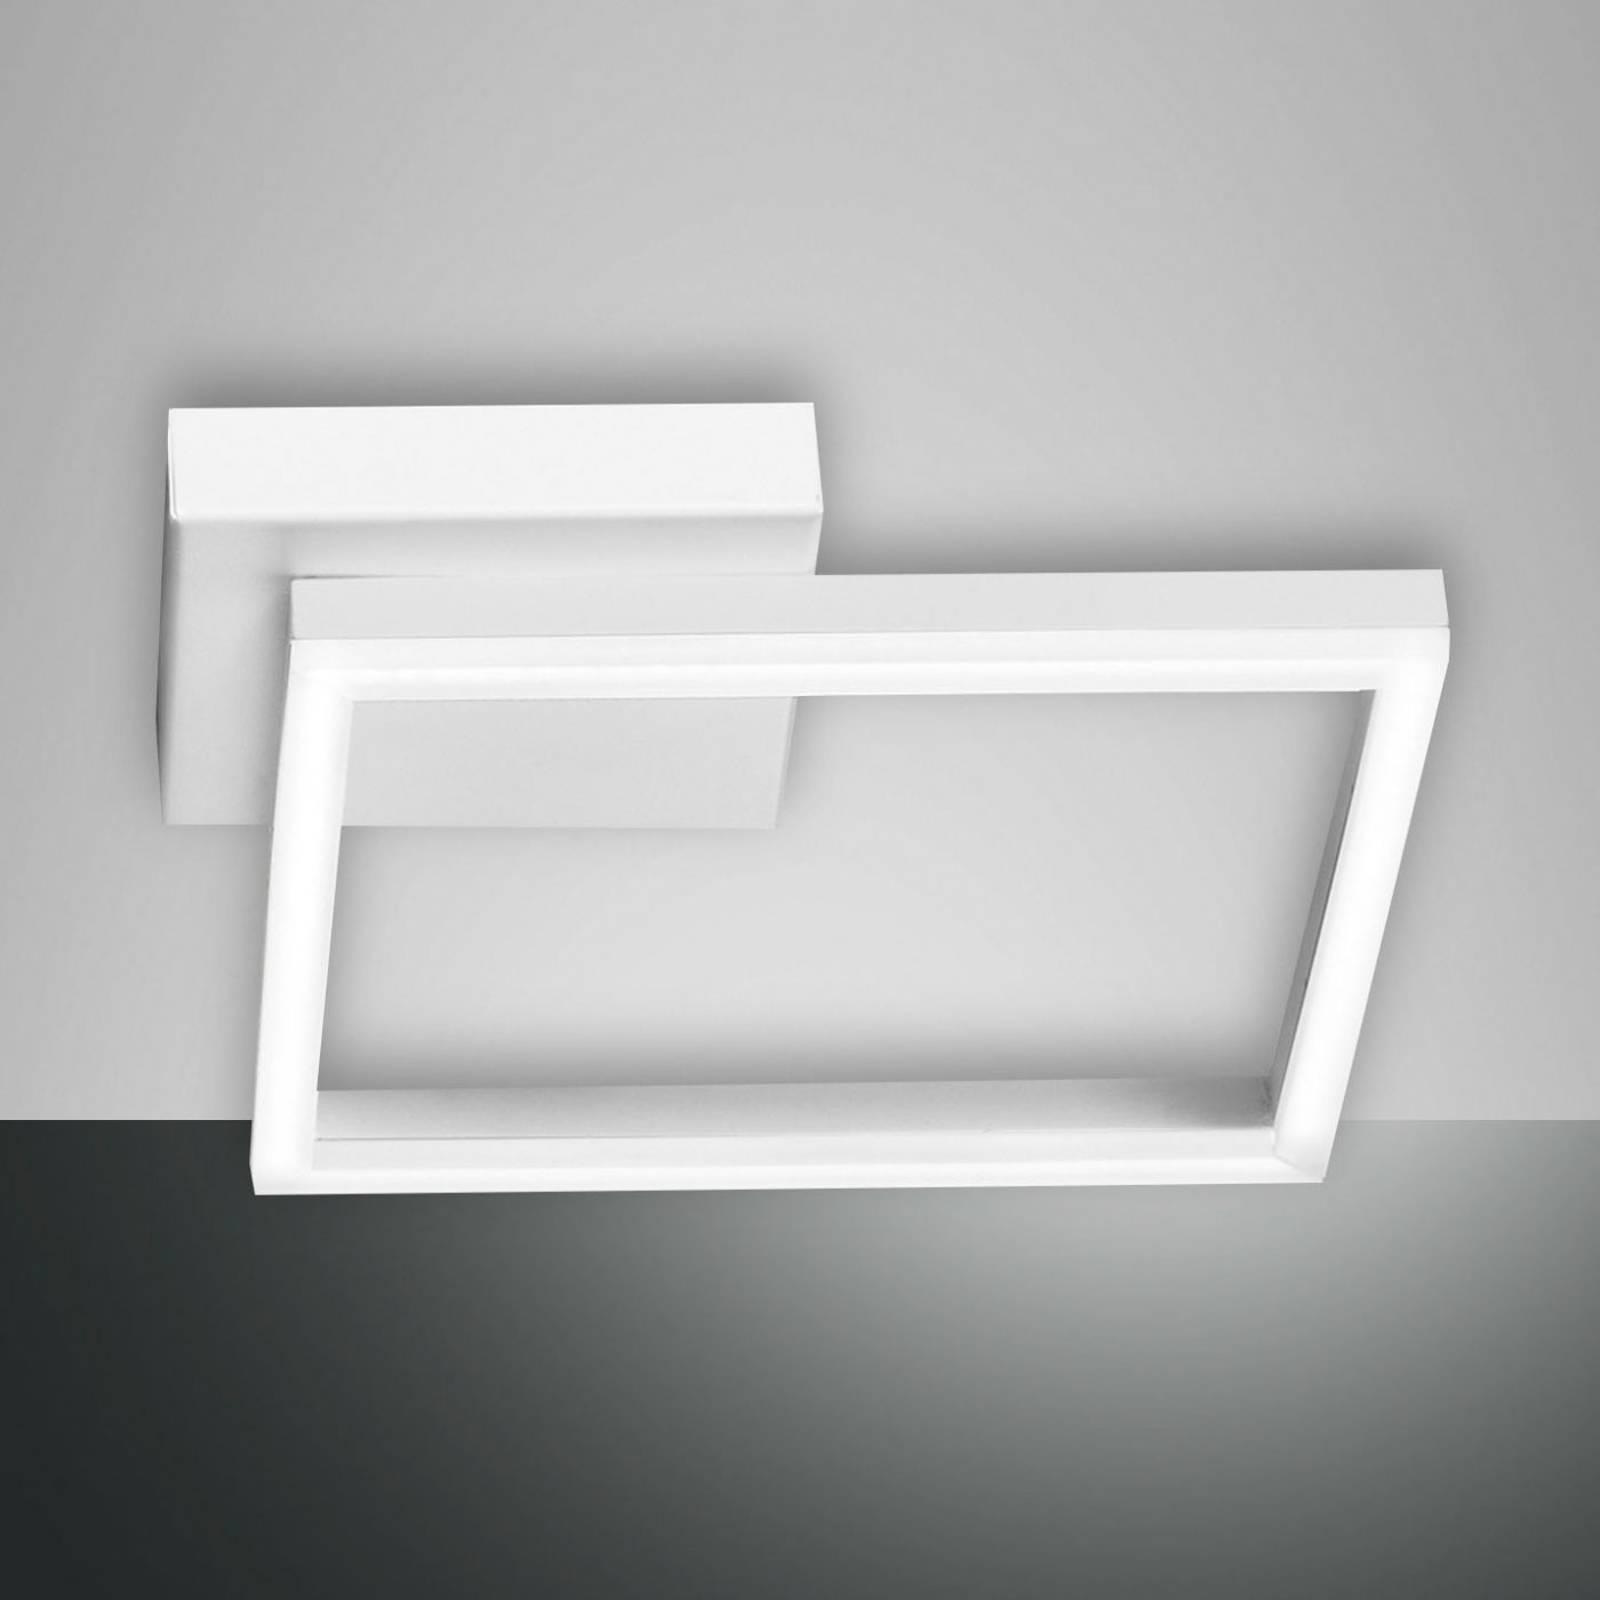 Lampa sufitowa LED Bard, 27x27cm, biała